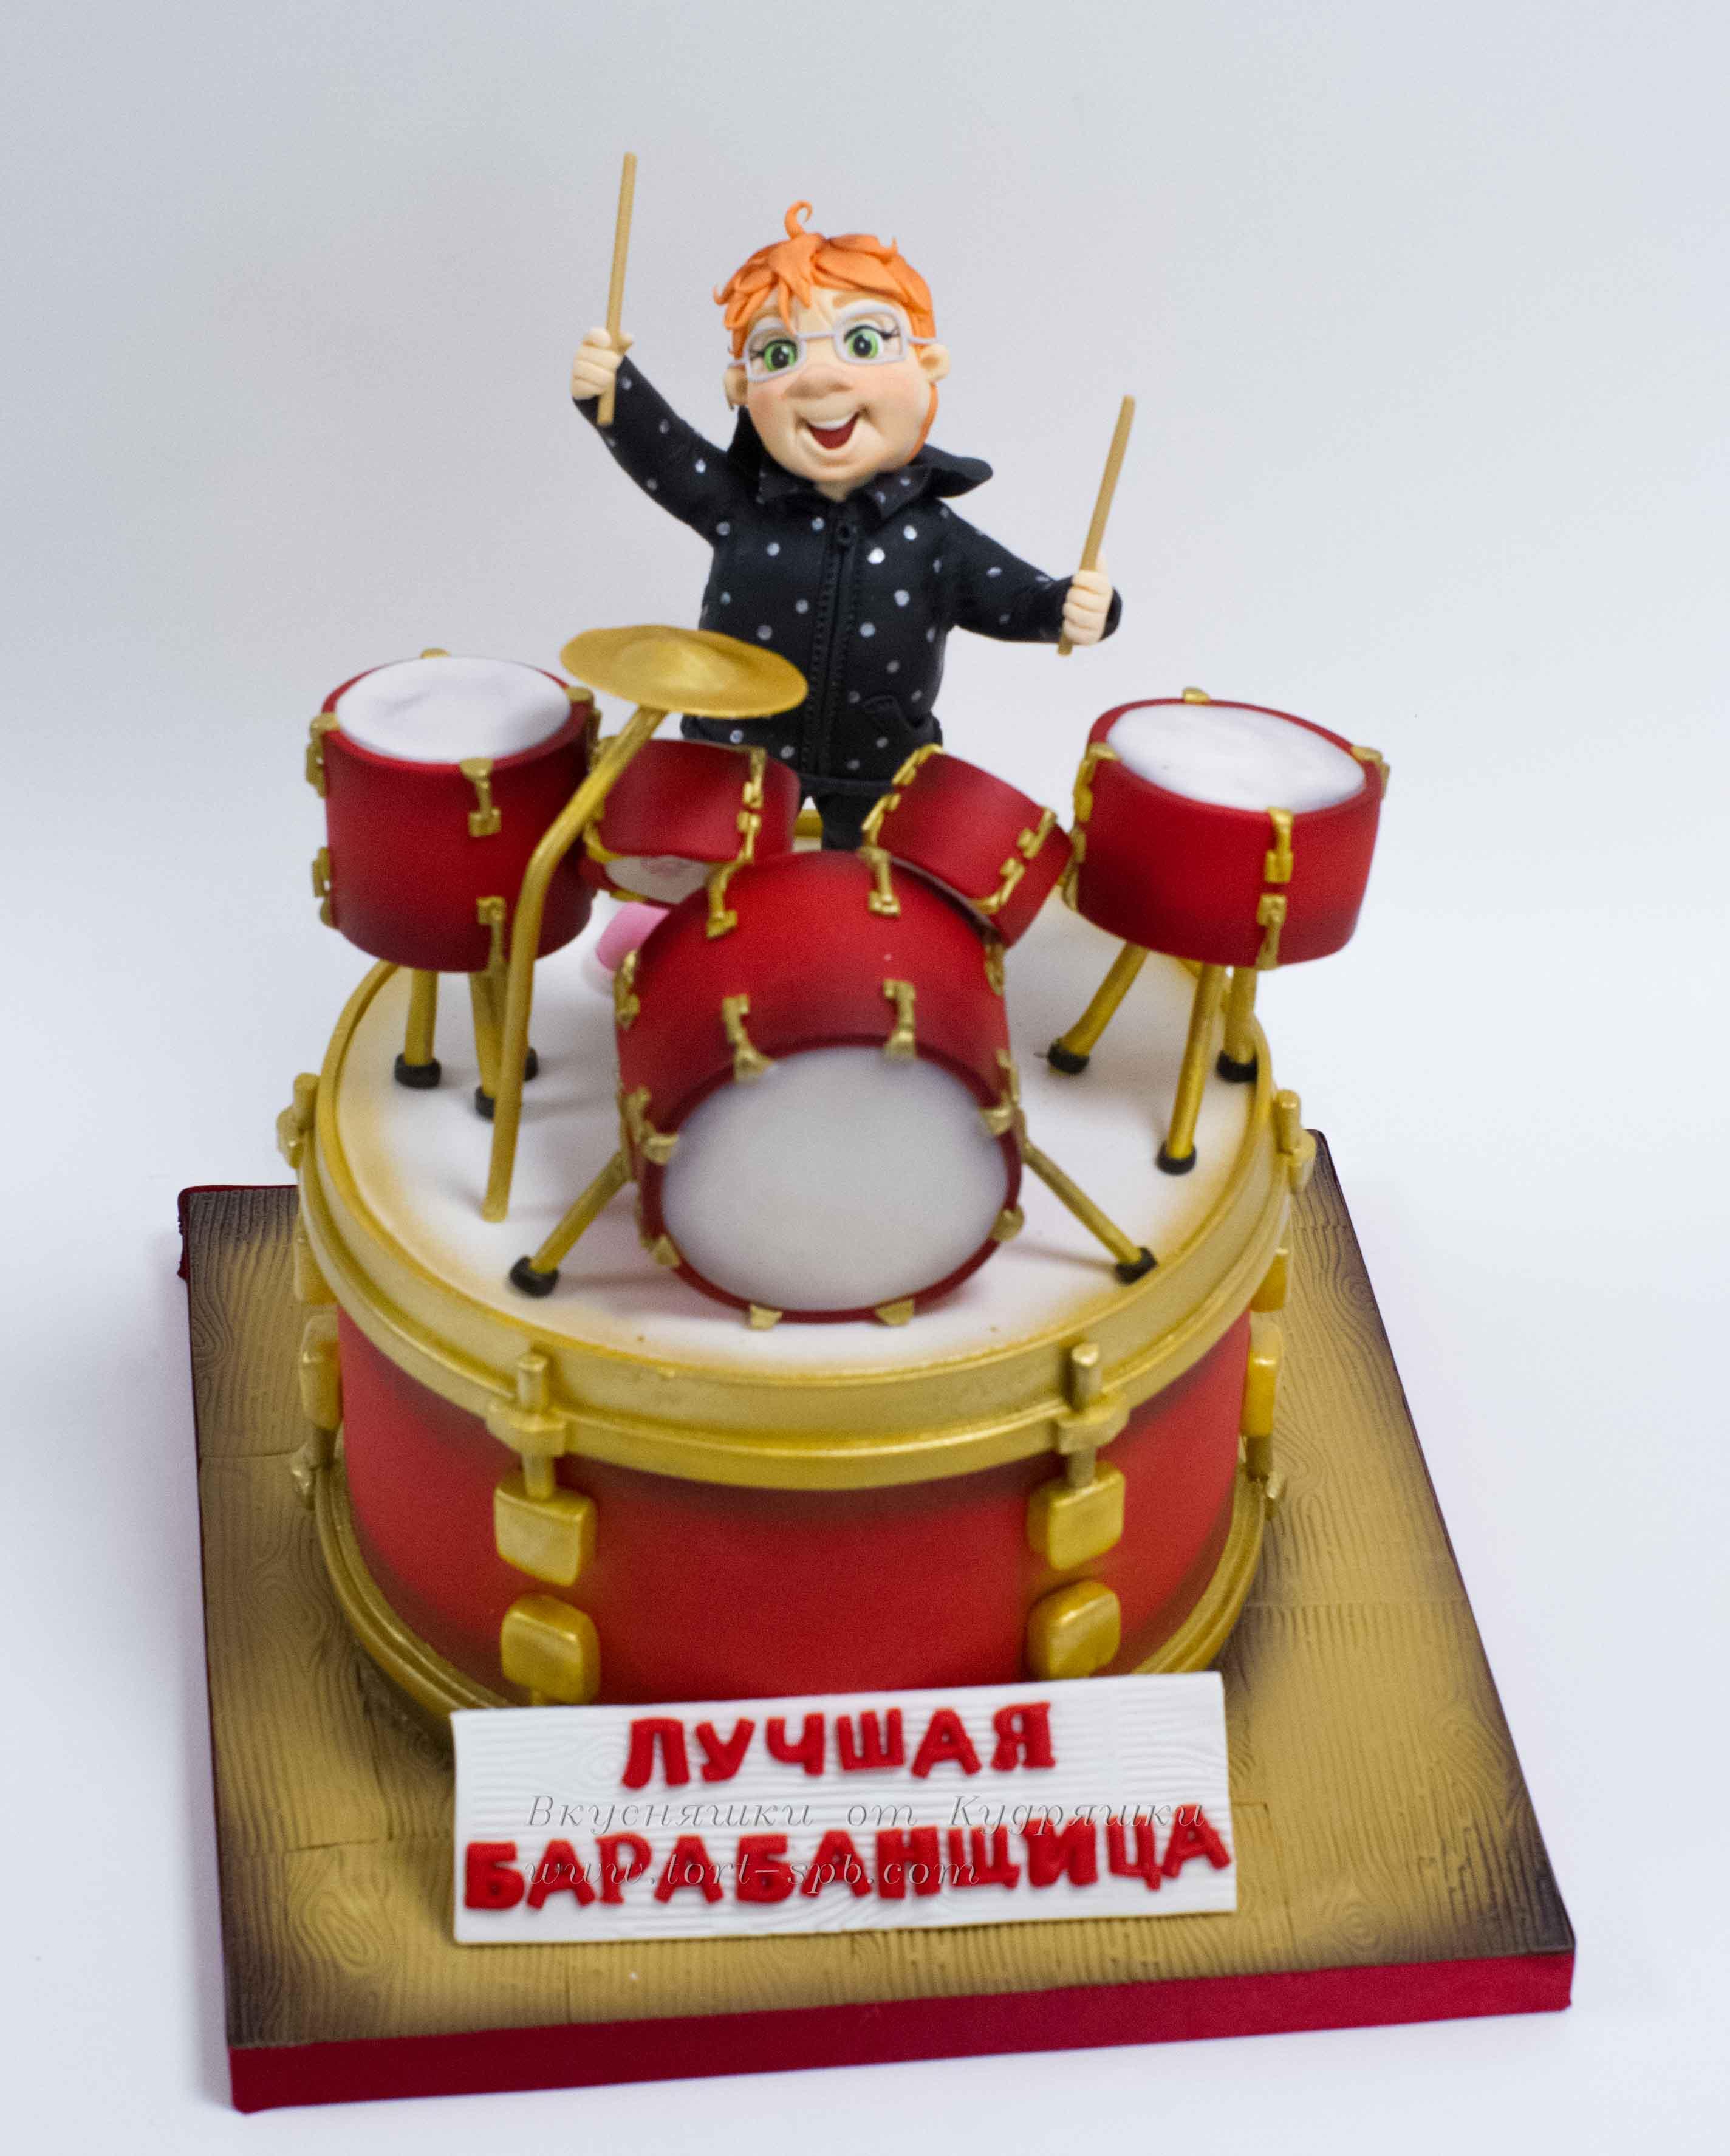 торт барабанщику